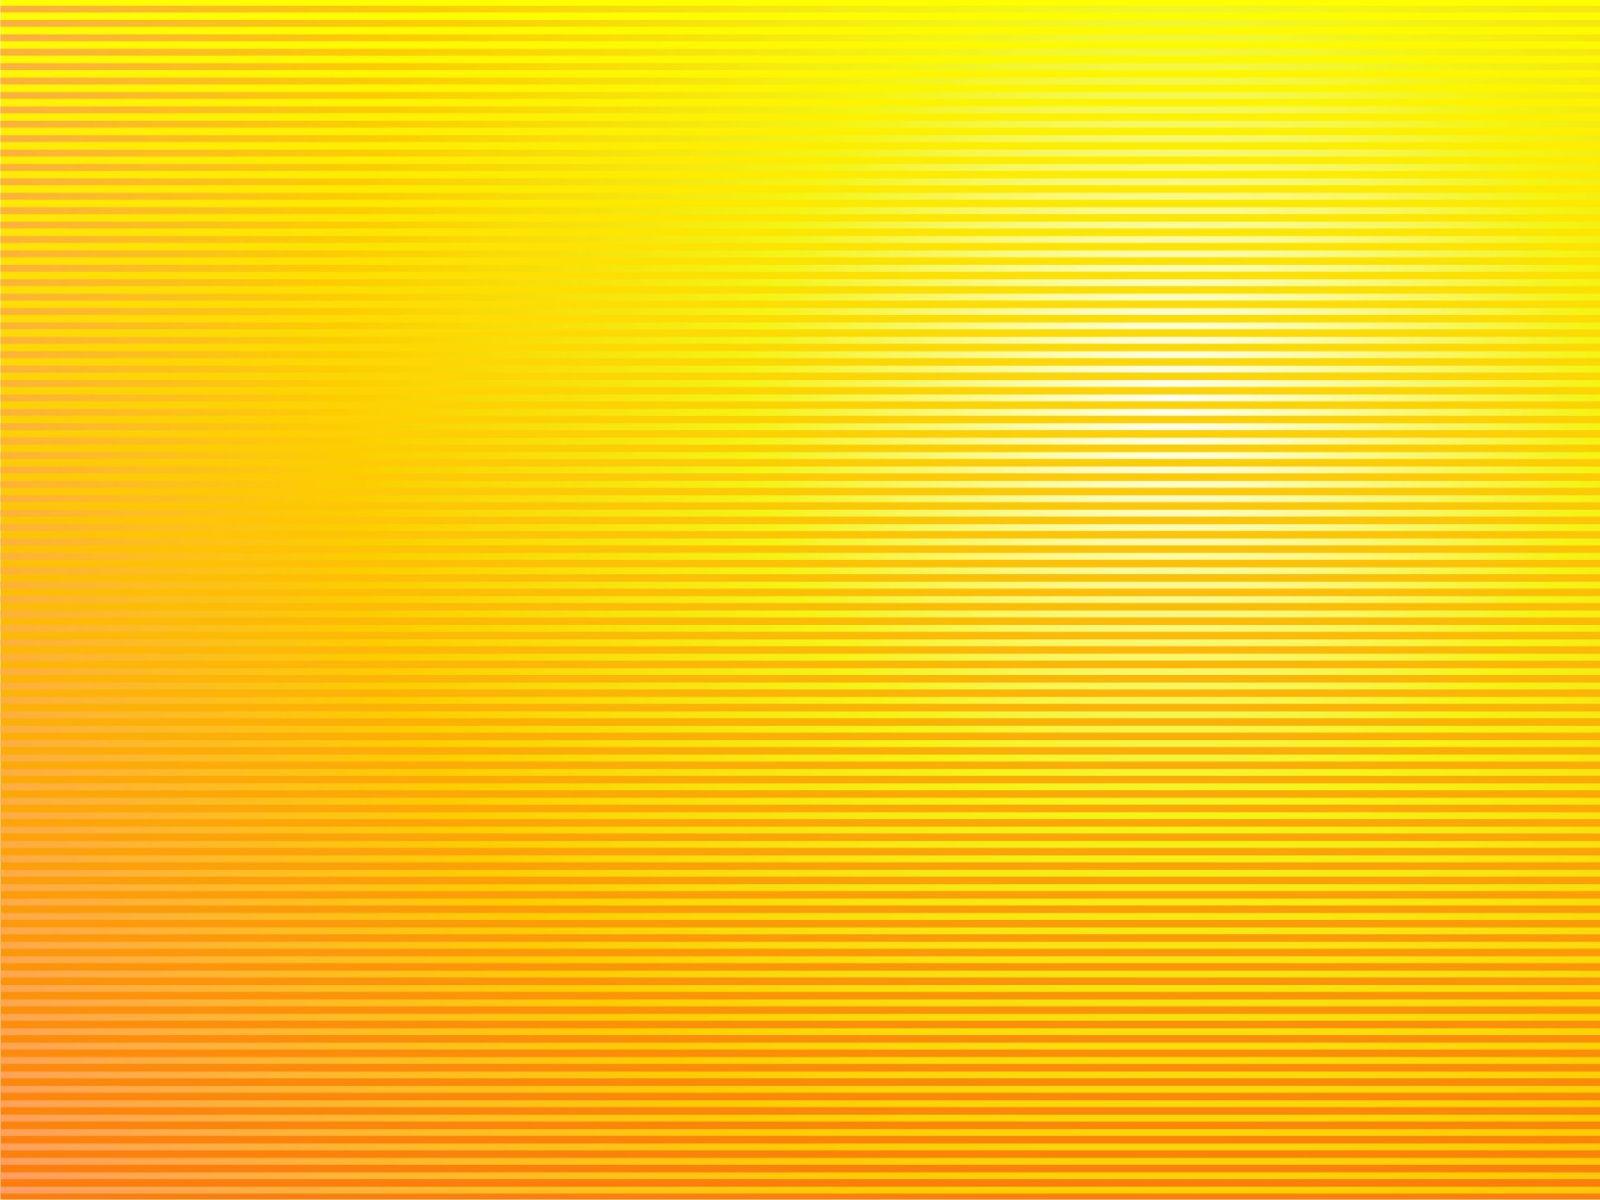 Free Yellow Background; Yellow Background; Yellow Background; Yellow Background; Yellow Background ...